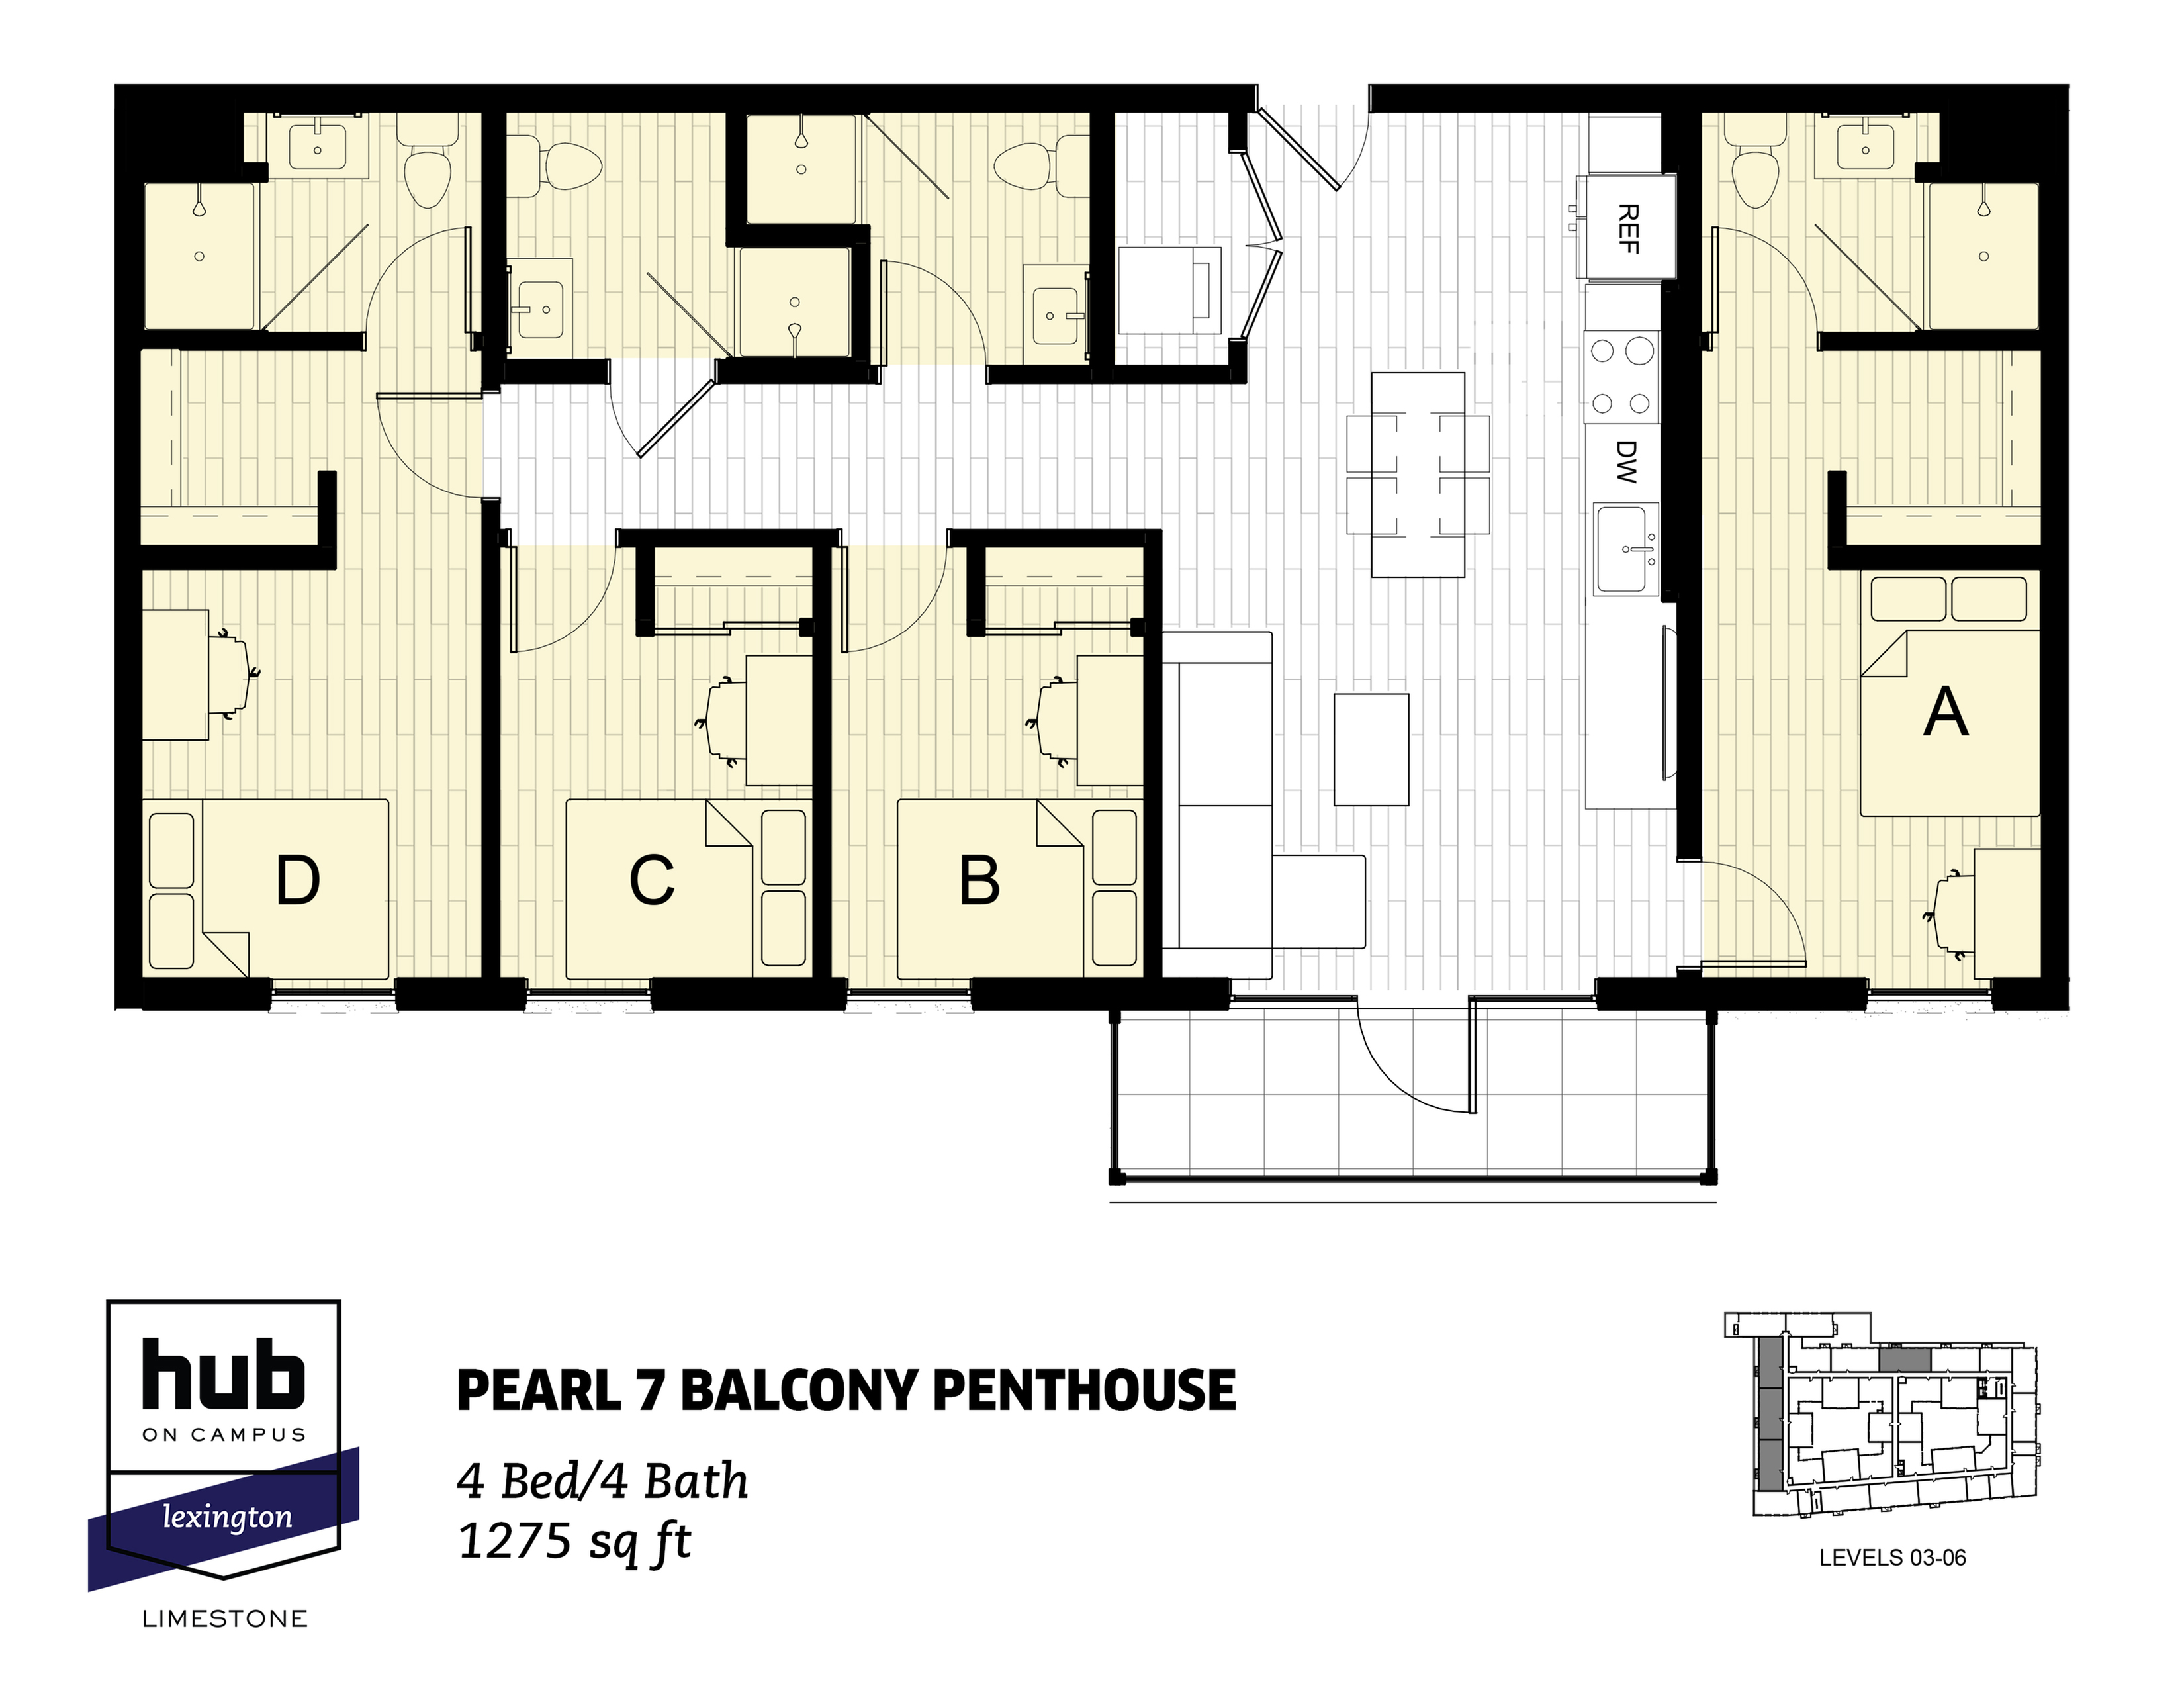 Pearl 7 Balcony Penthouse